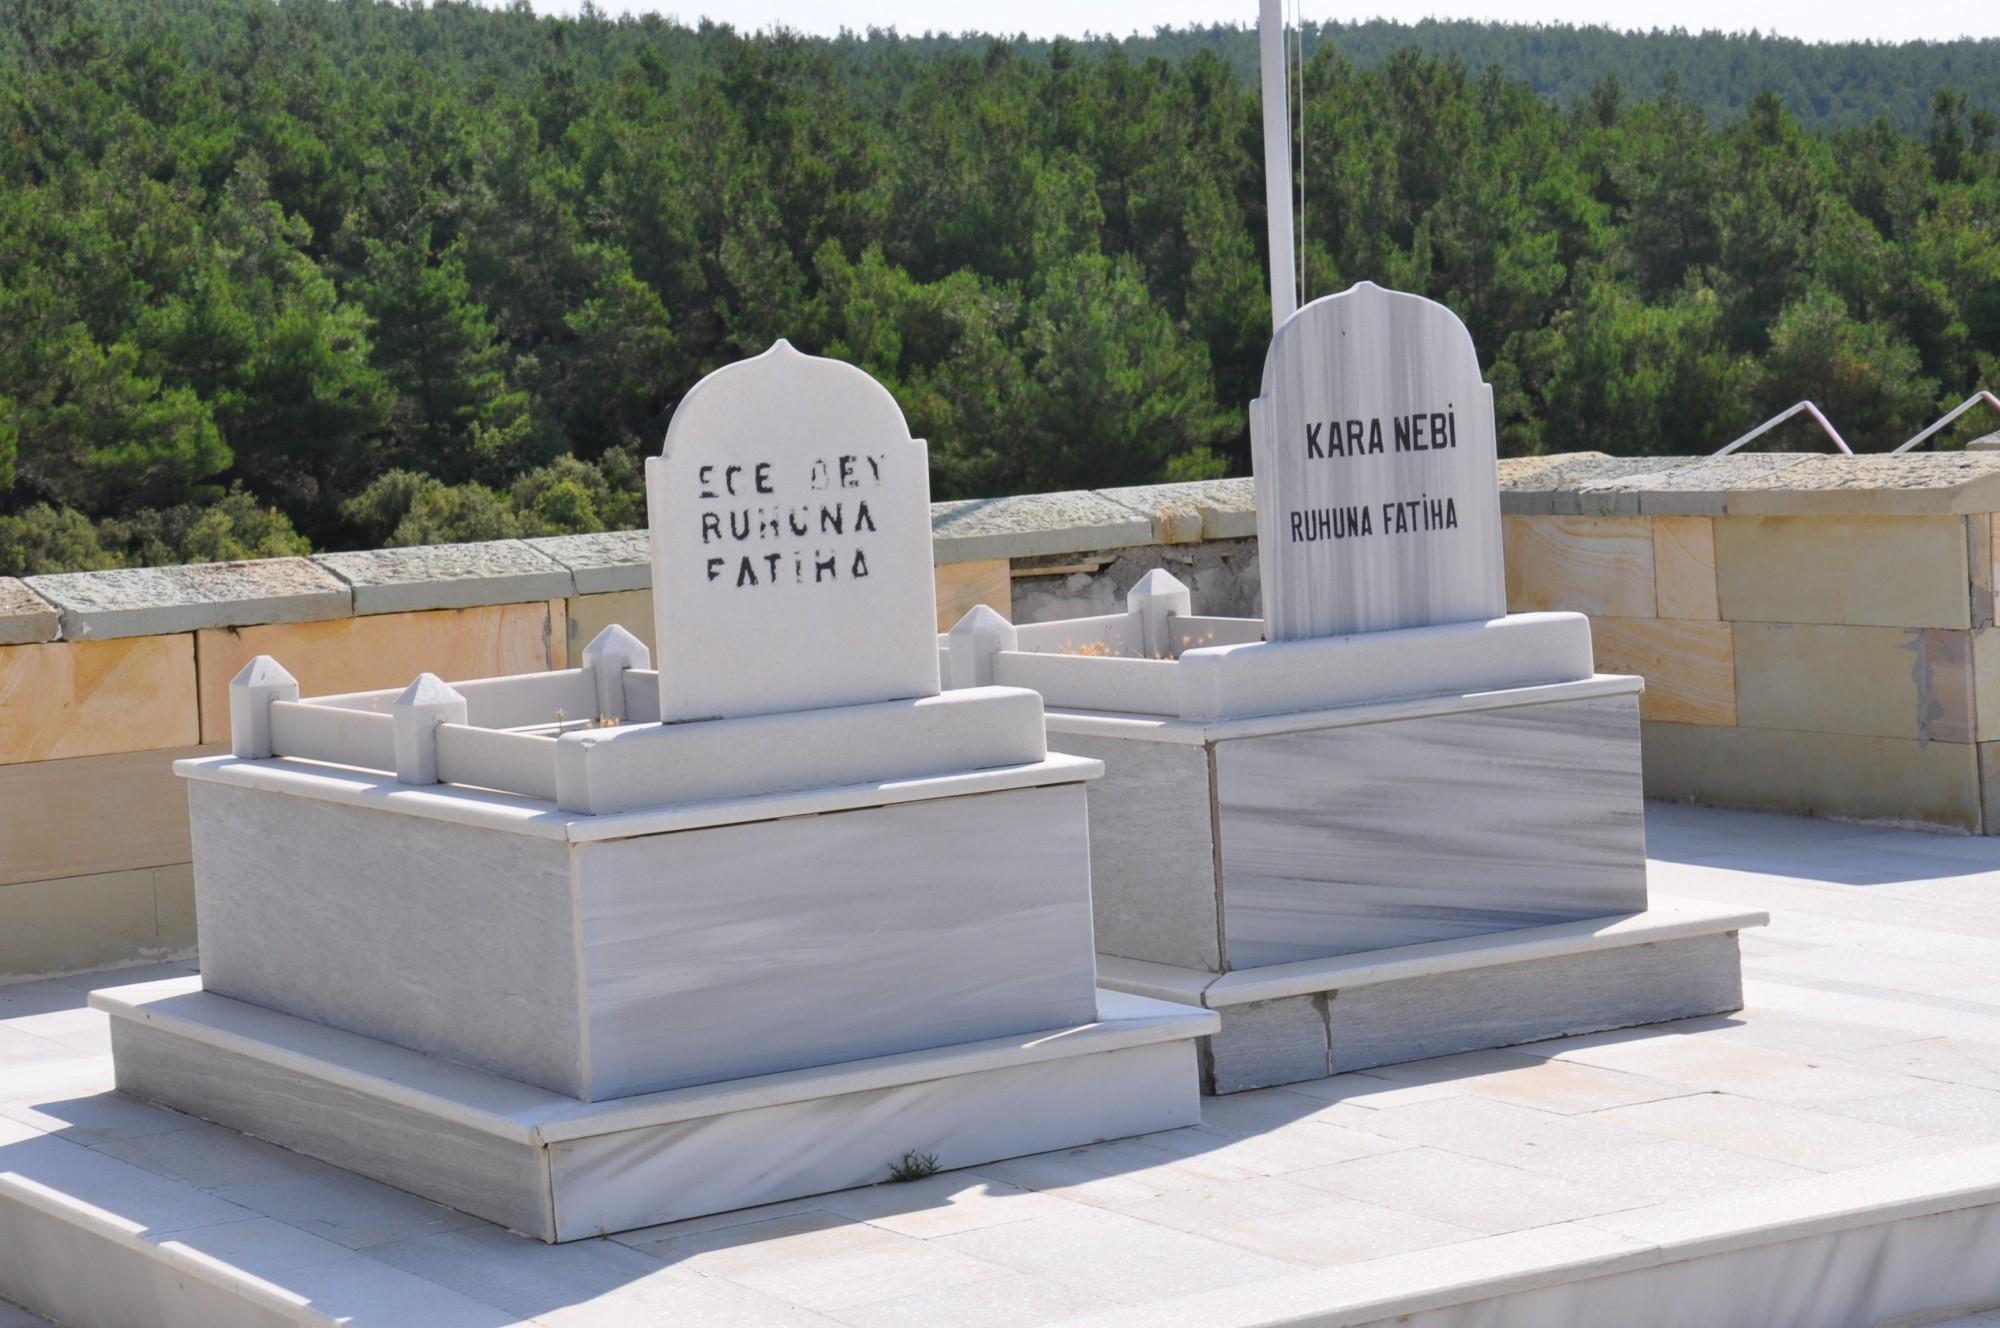 Ecebey Mausoleum